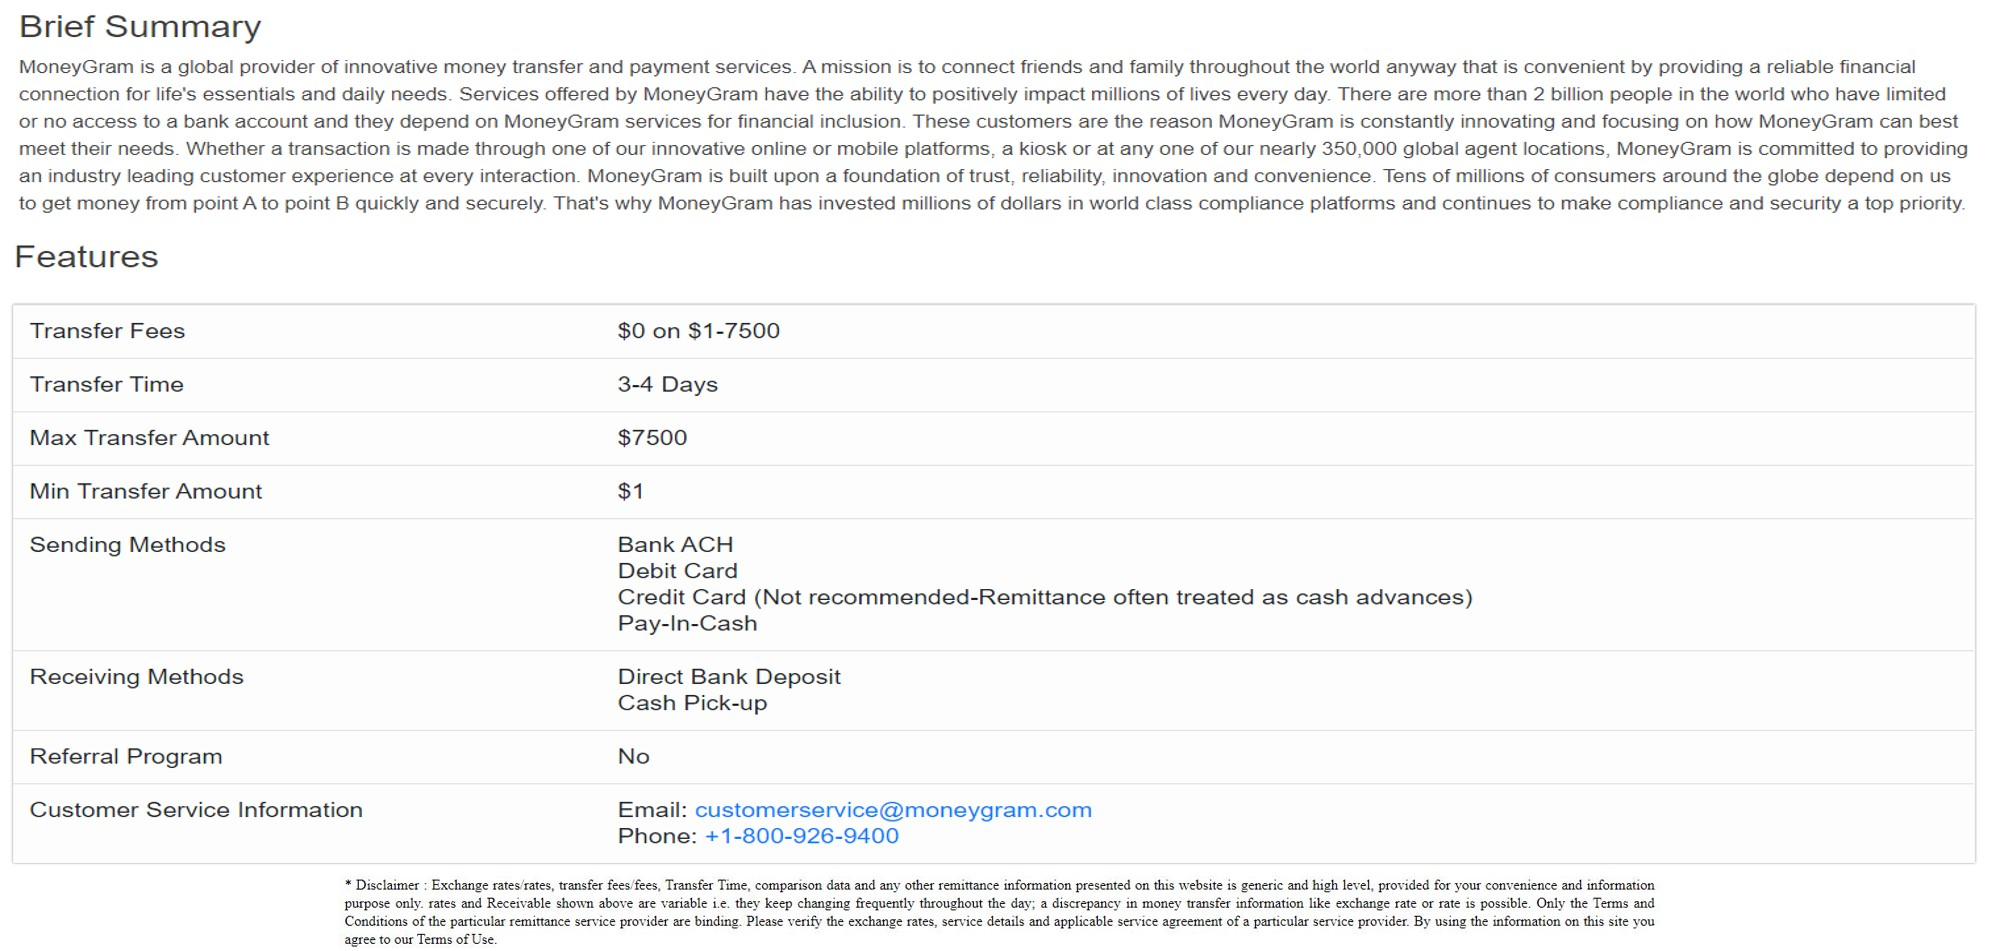 send money to India using MoneyGram last step